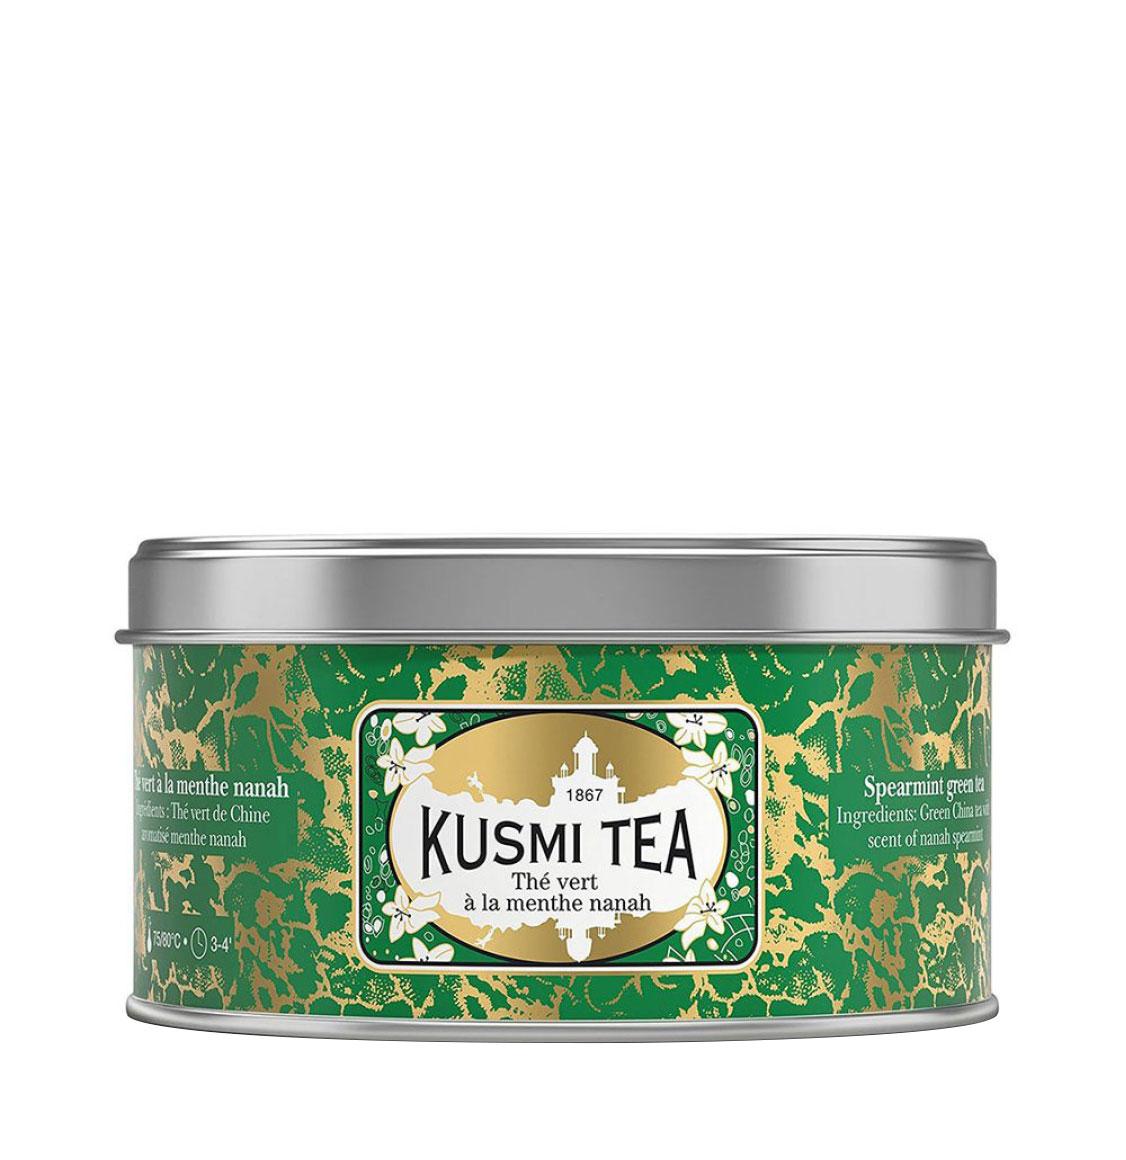 Kusmi Tea Spearmint Green Tea 125g